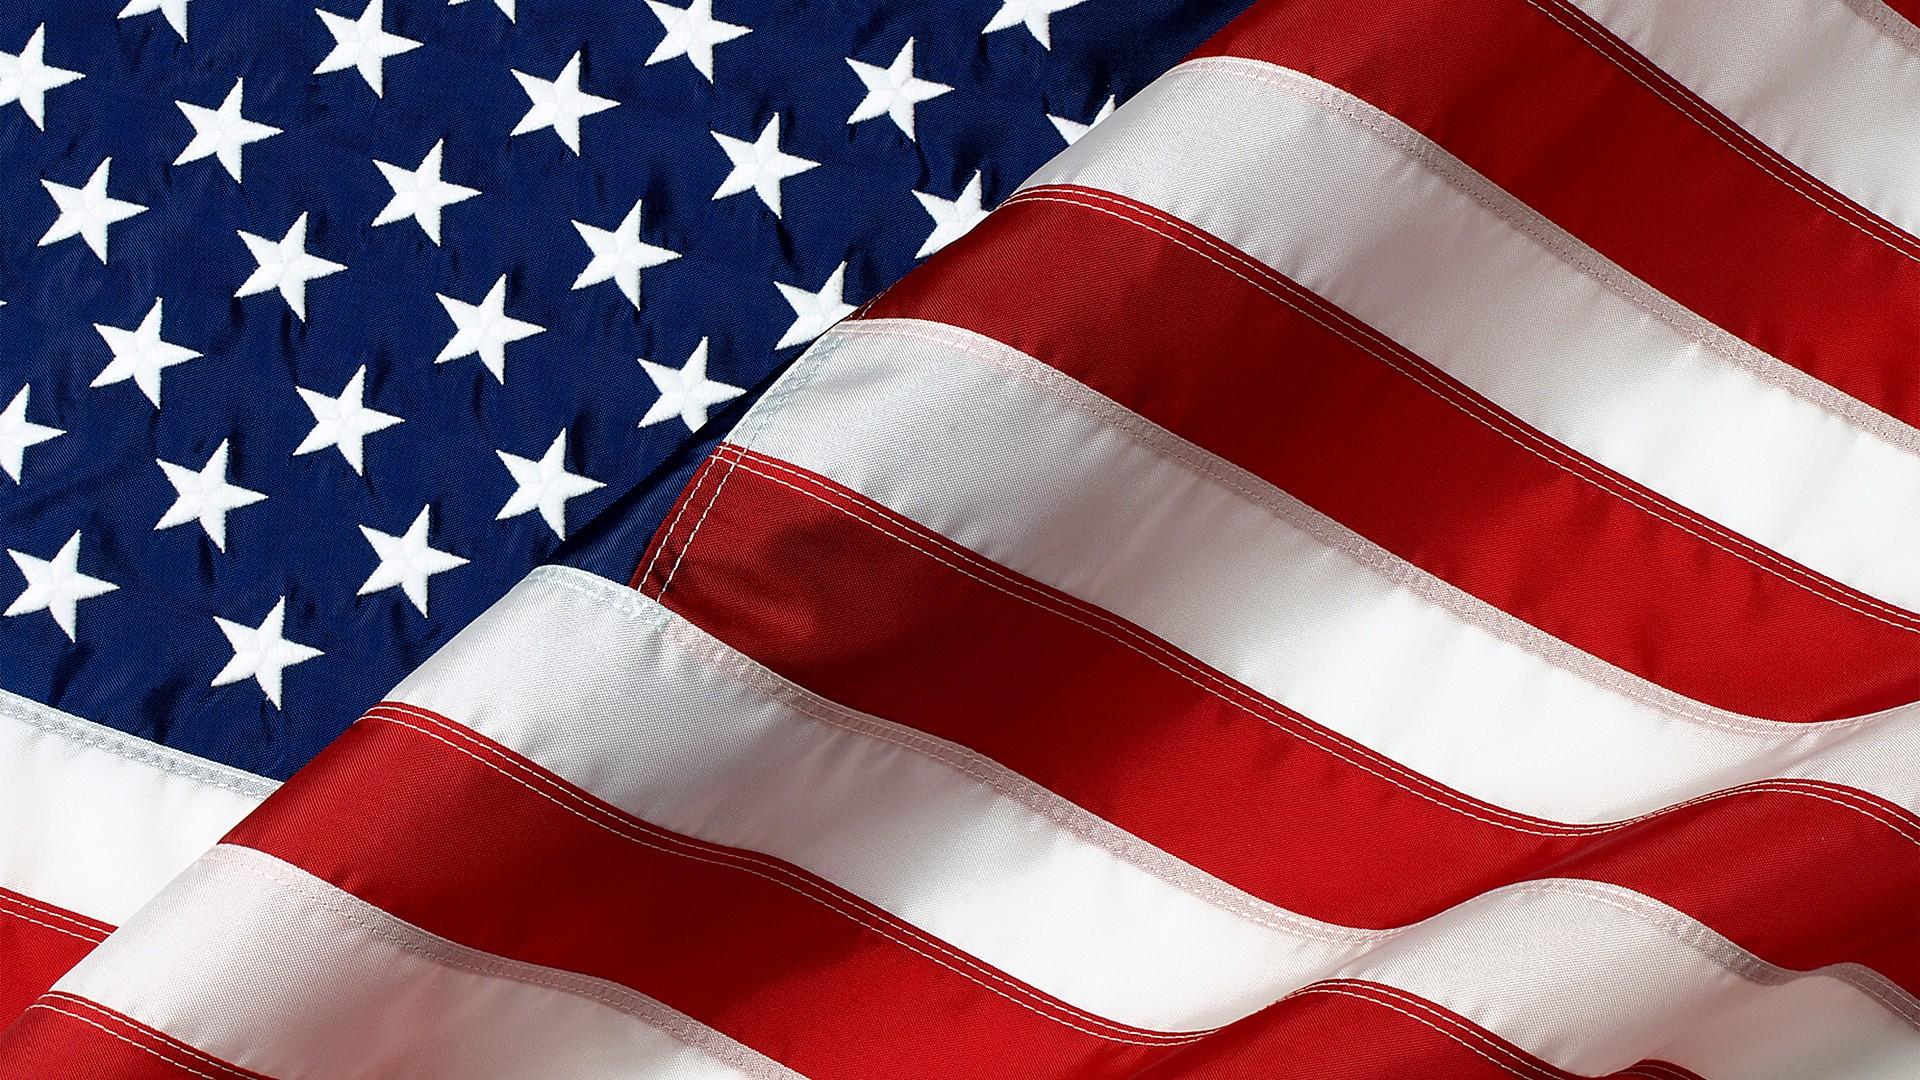 American Flag Wallpaper 1920x1080 American Flag 1920x1080